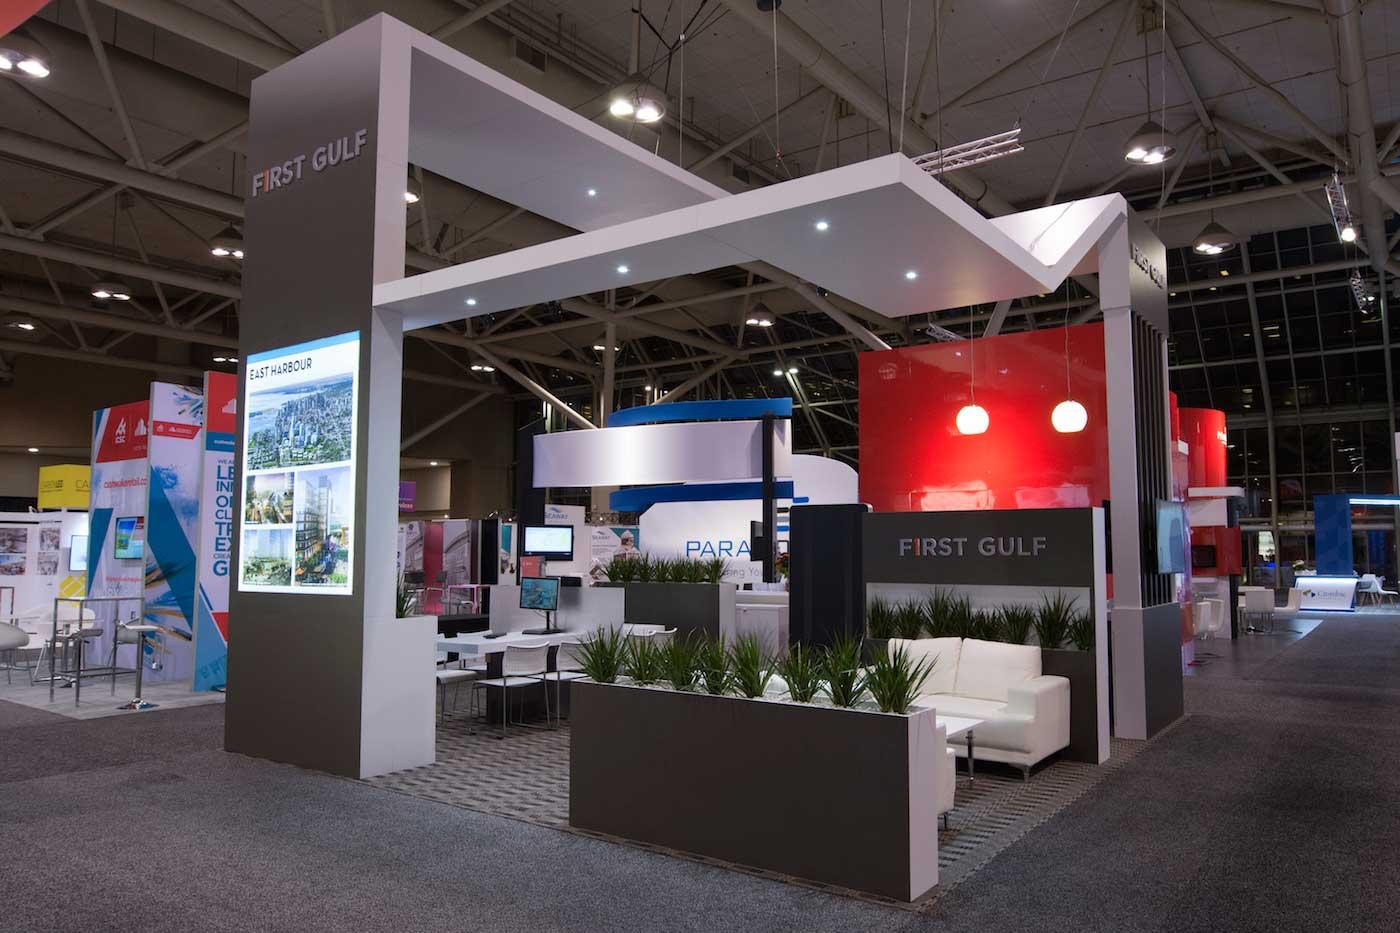 Trade Show Booth Lounge : First gulf u maverick exhibits u custom trade show exhibit design